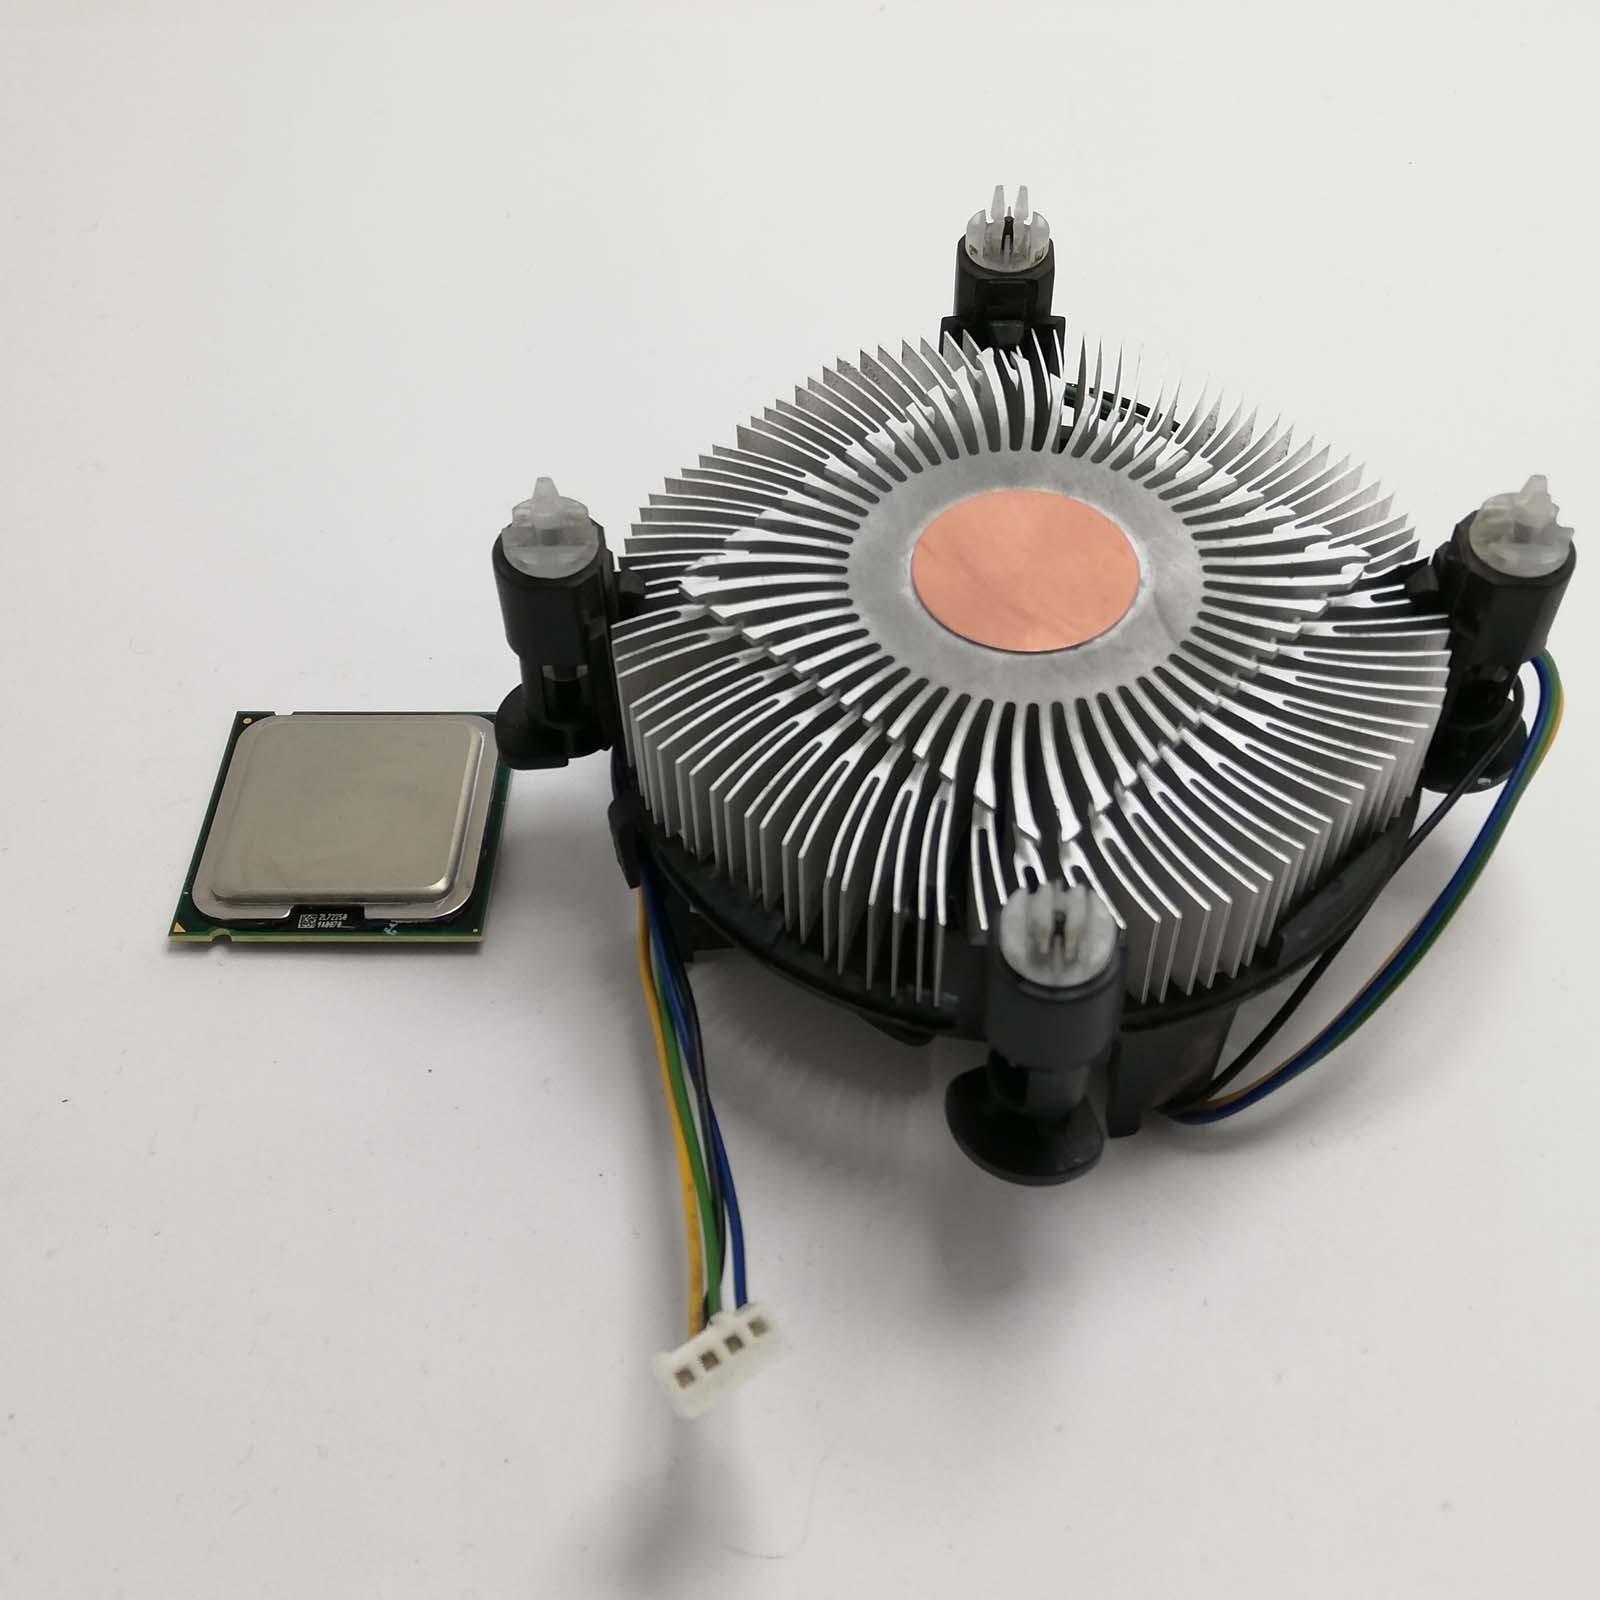 CPU PROCESSORE INTEL CORE DUO 2 E6550 6550 775 64BIT 2.33GHZ/4M/1333MHZ